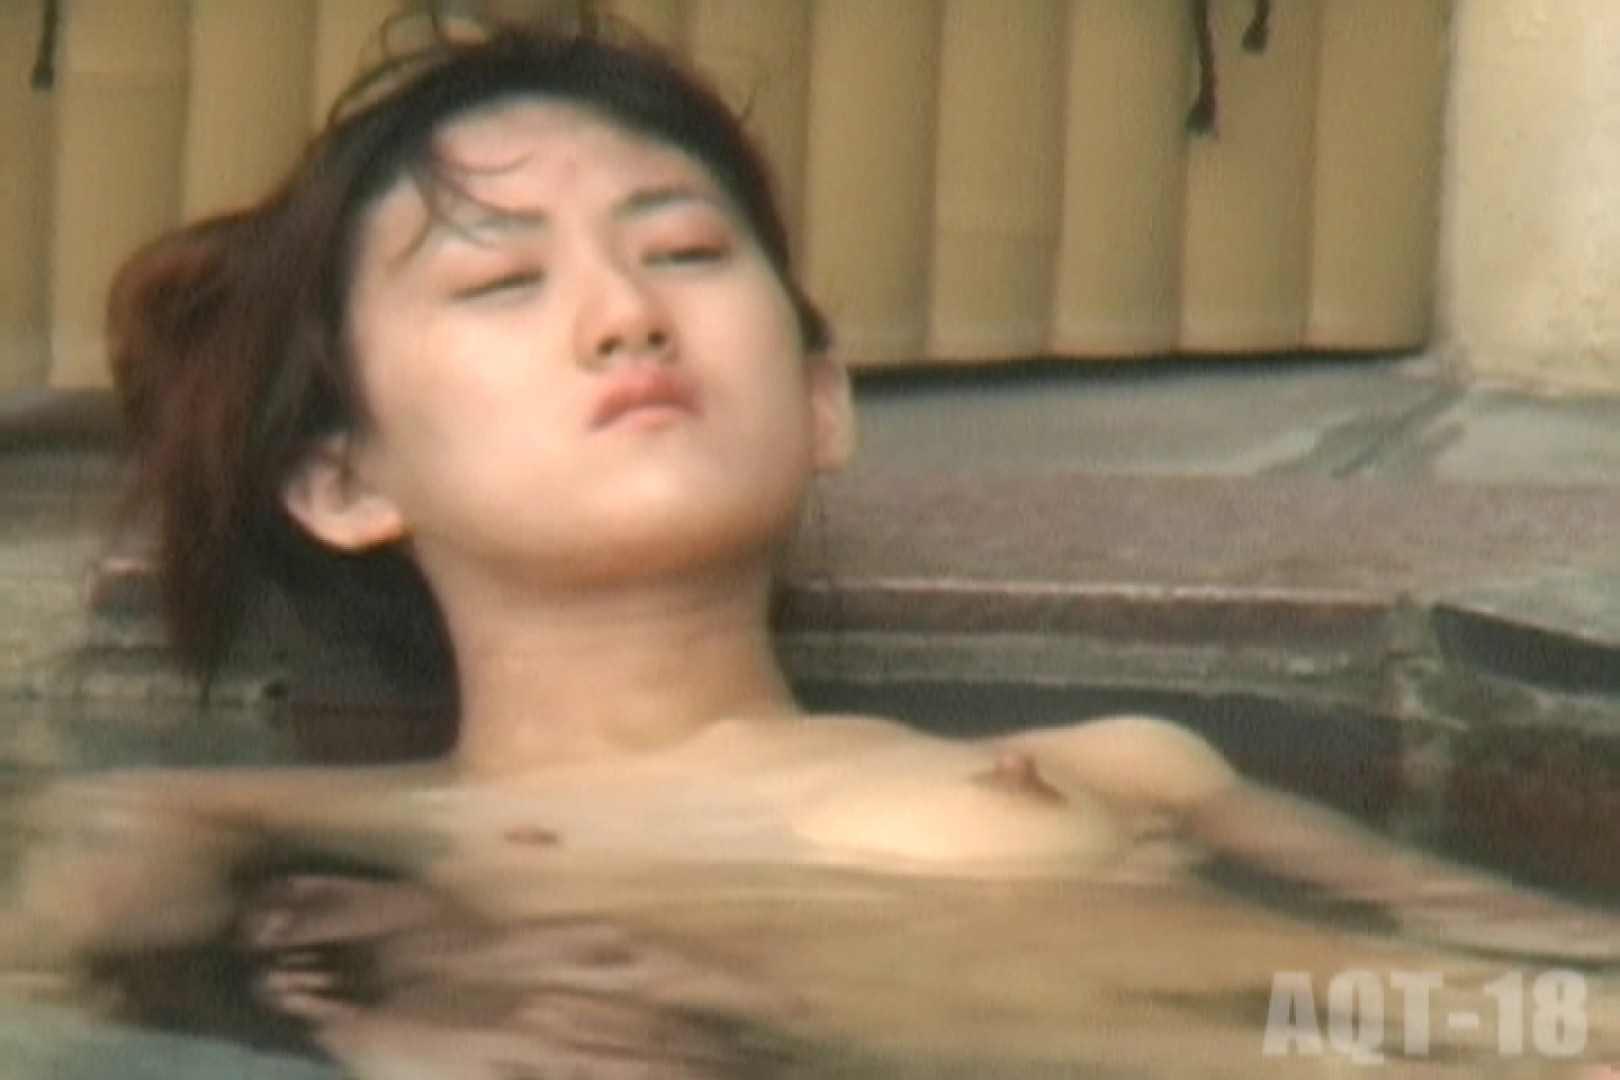 Aquaな露天風呂Vol.862 美しいOLの裸体 戯れ無修正画像 99pic 74